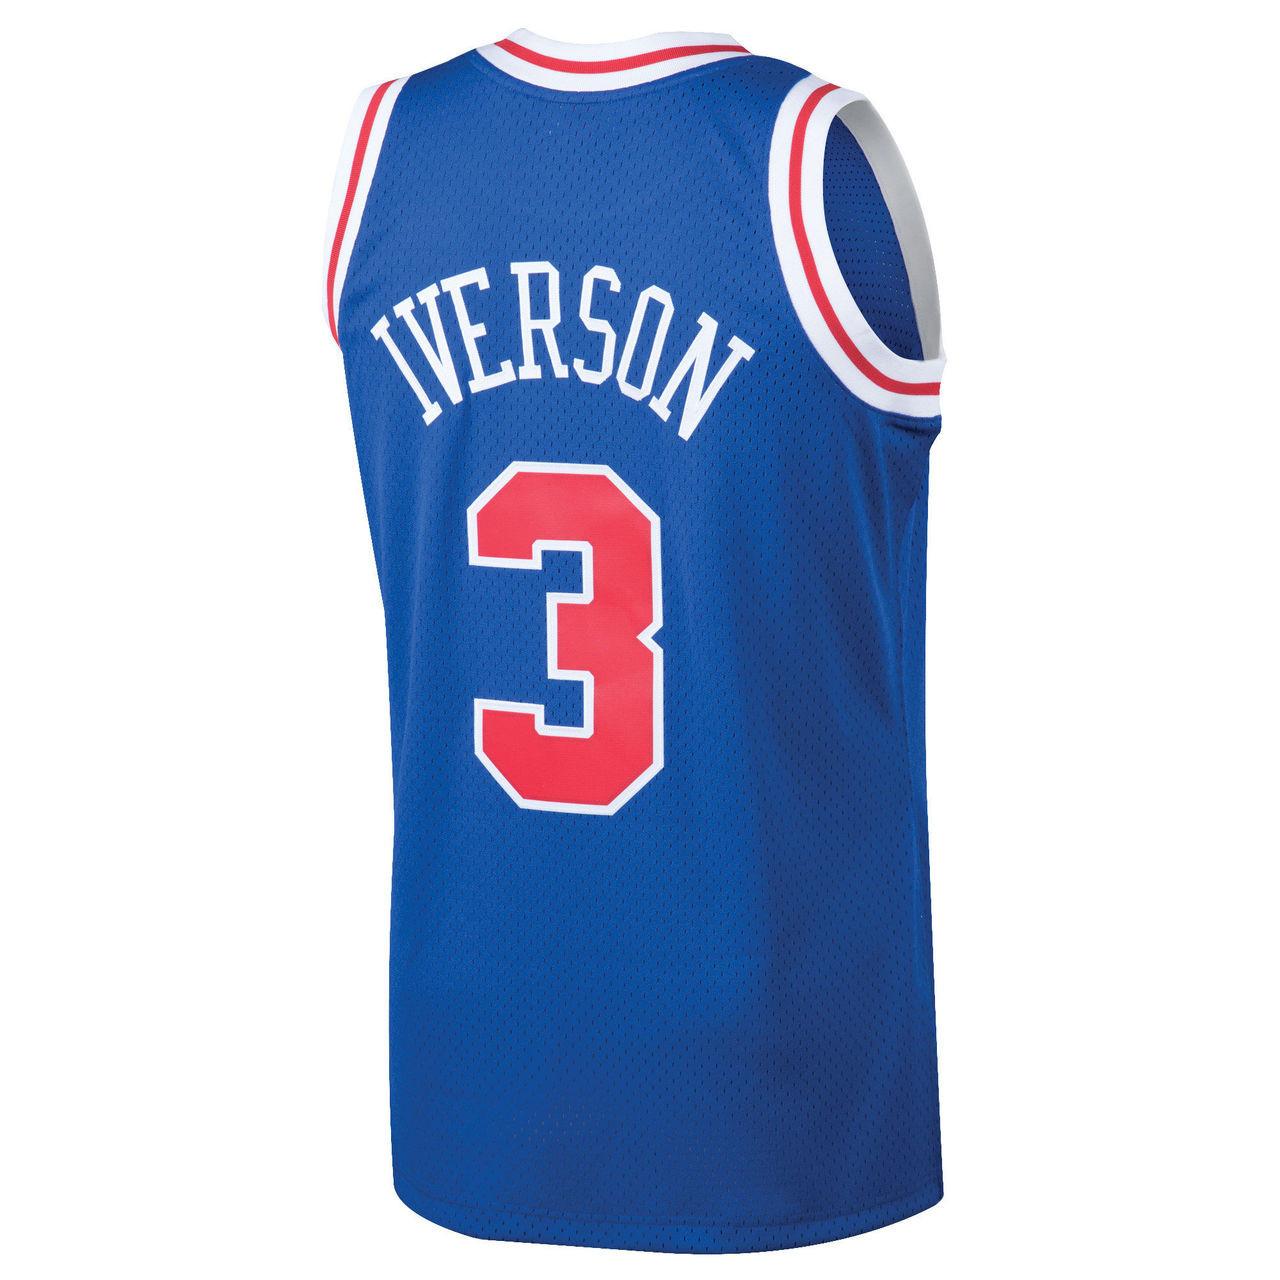 online store d76cb 2a8d6 Allen Iverson Philadelphia 76ers Mitchell & Ness 1996-97 Hardwood Classics  Swingman Jersey - Royal